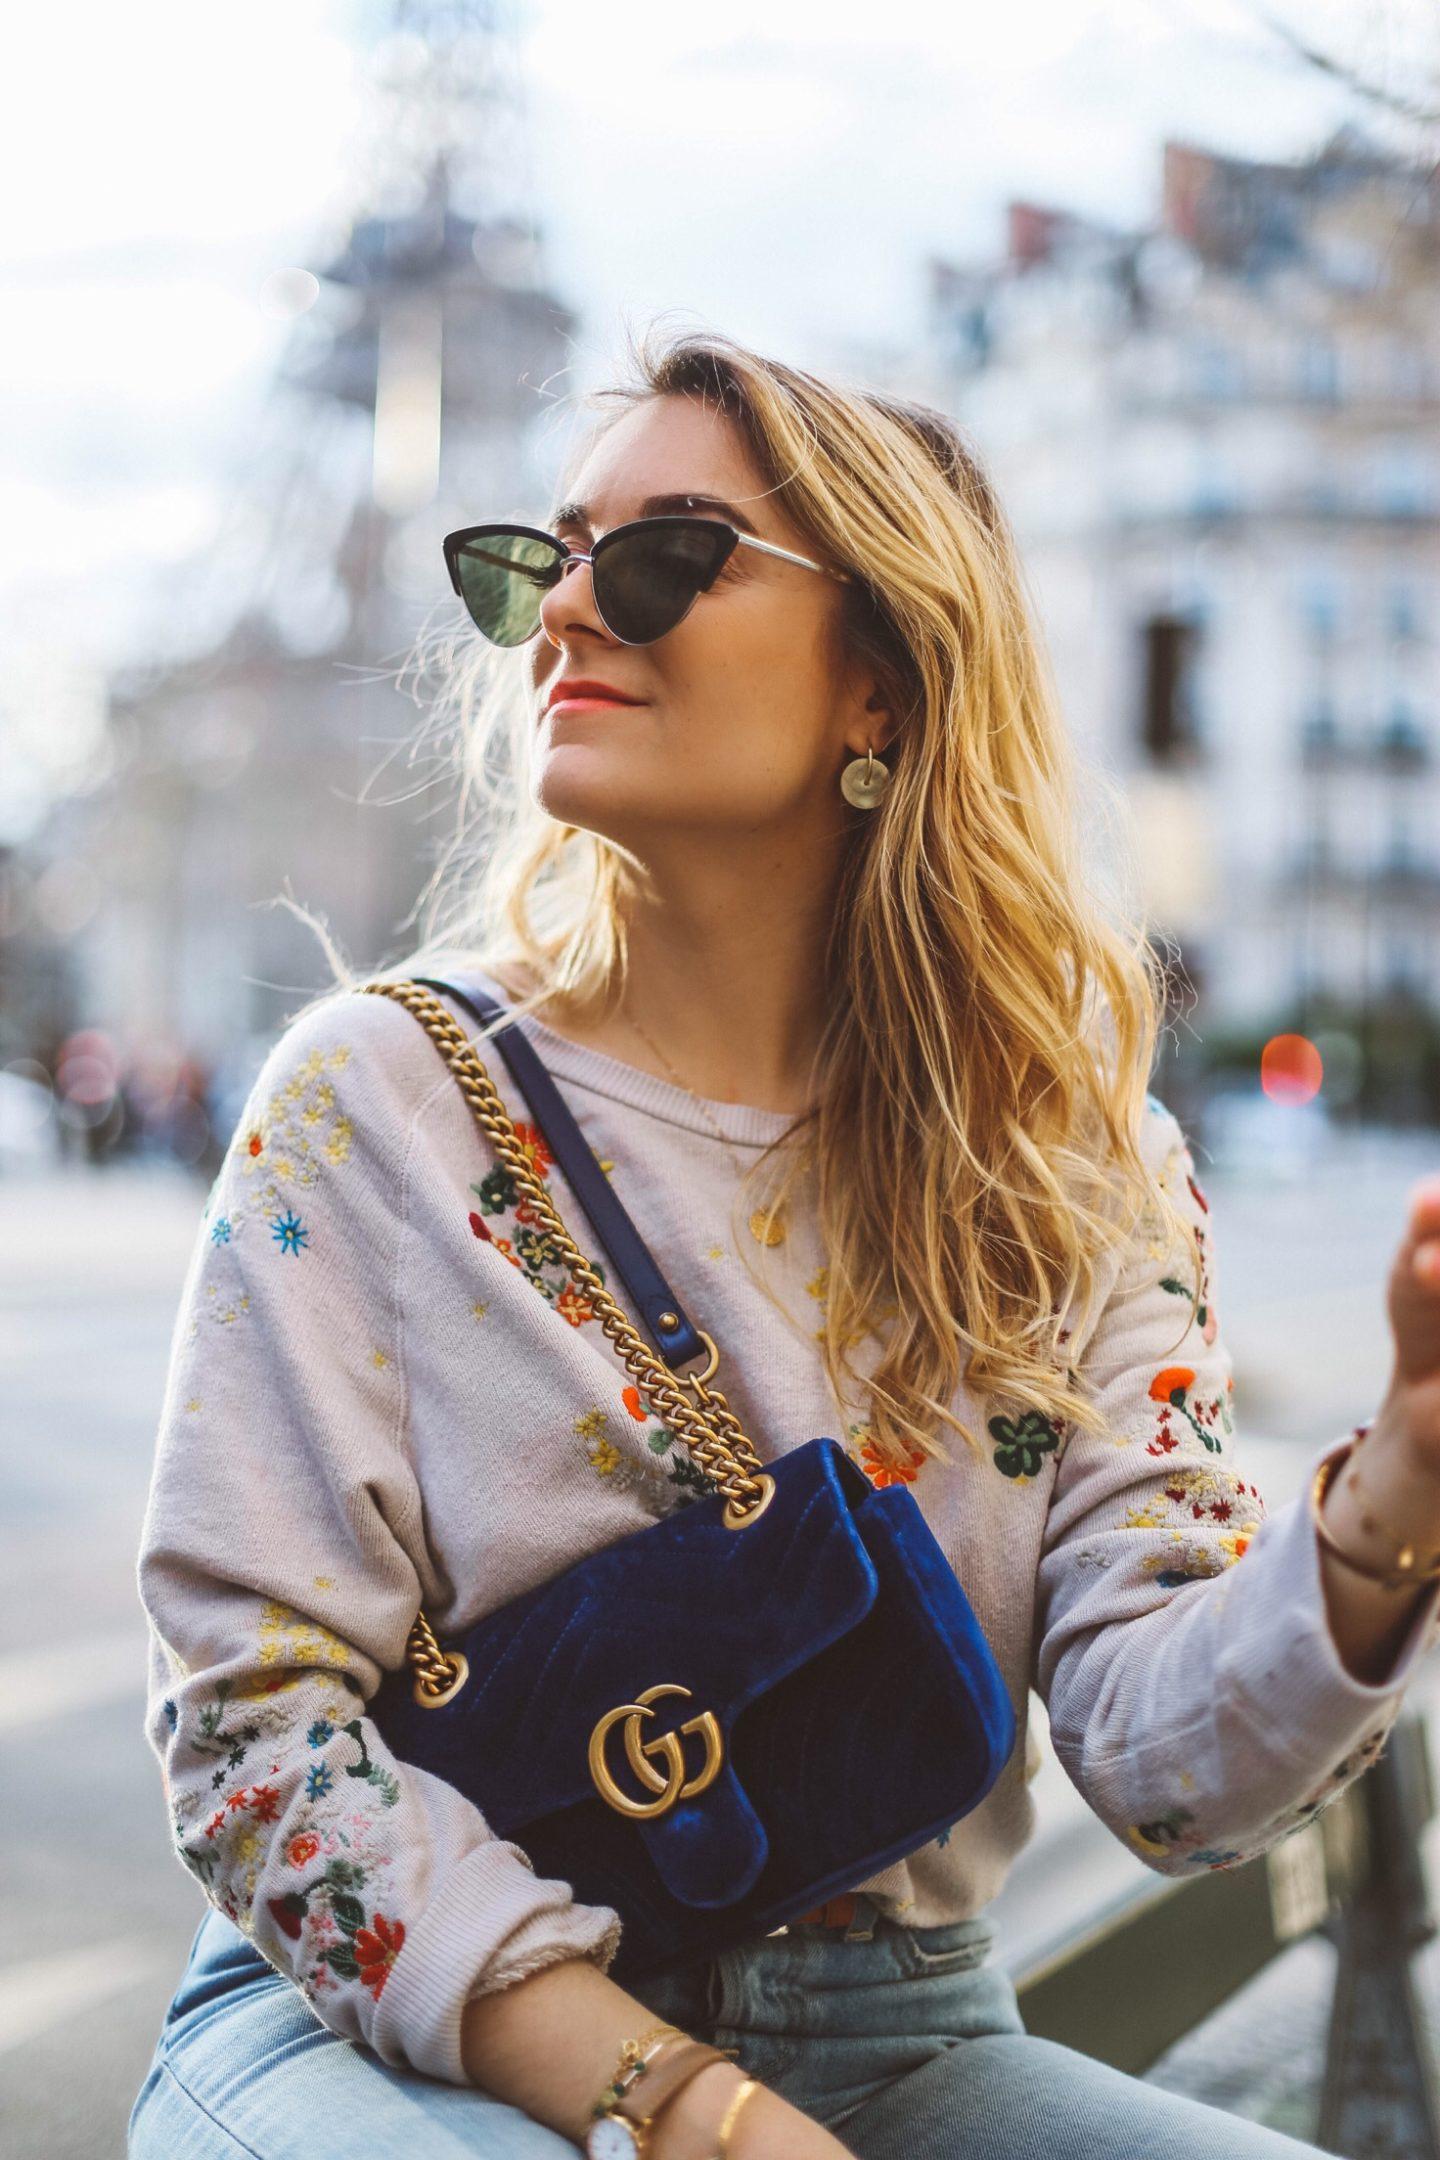 Cat eye lunettes - Blondie Baby blog mode et voyages